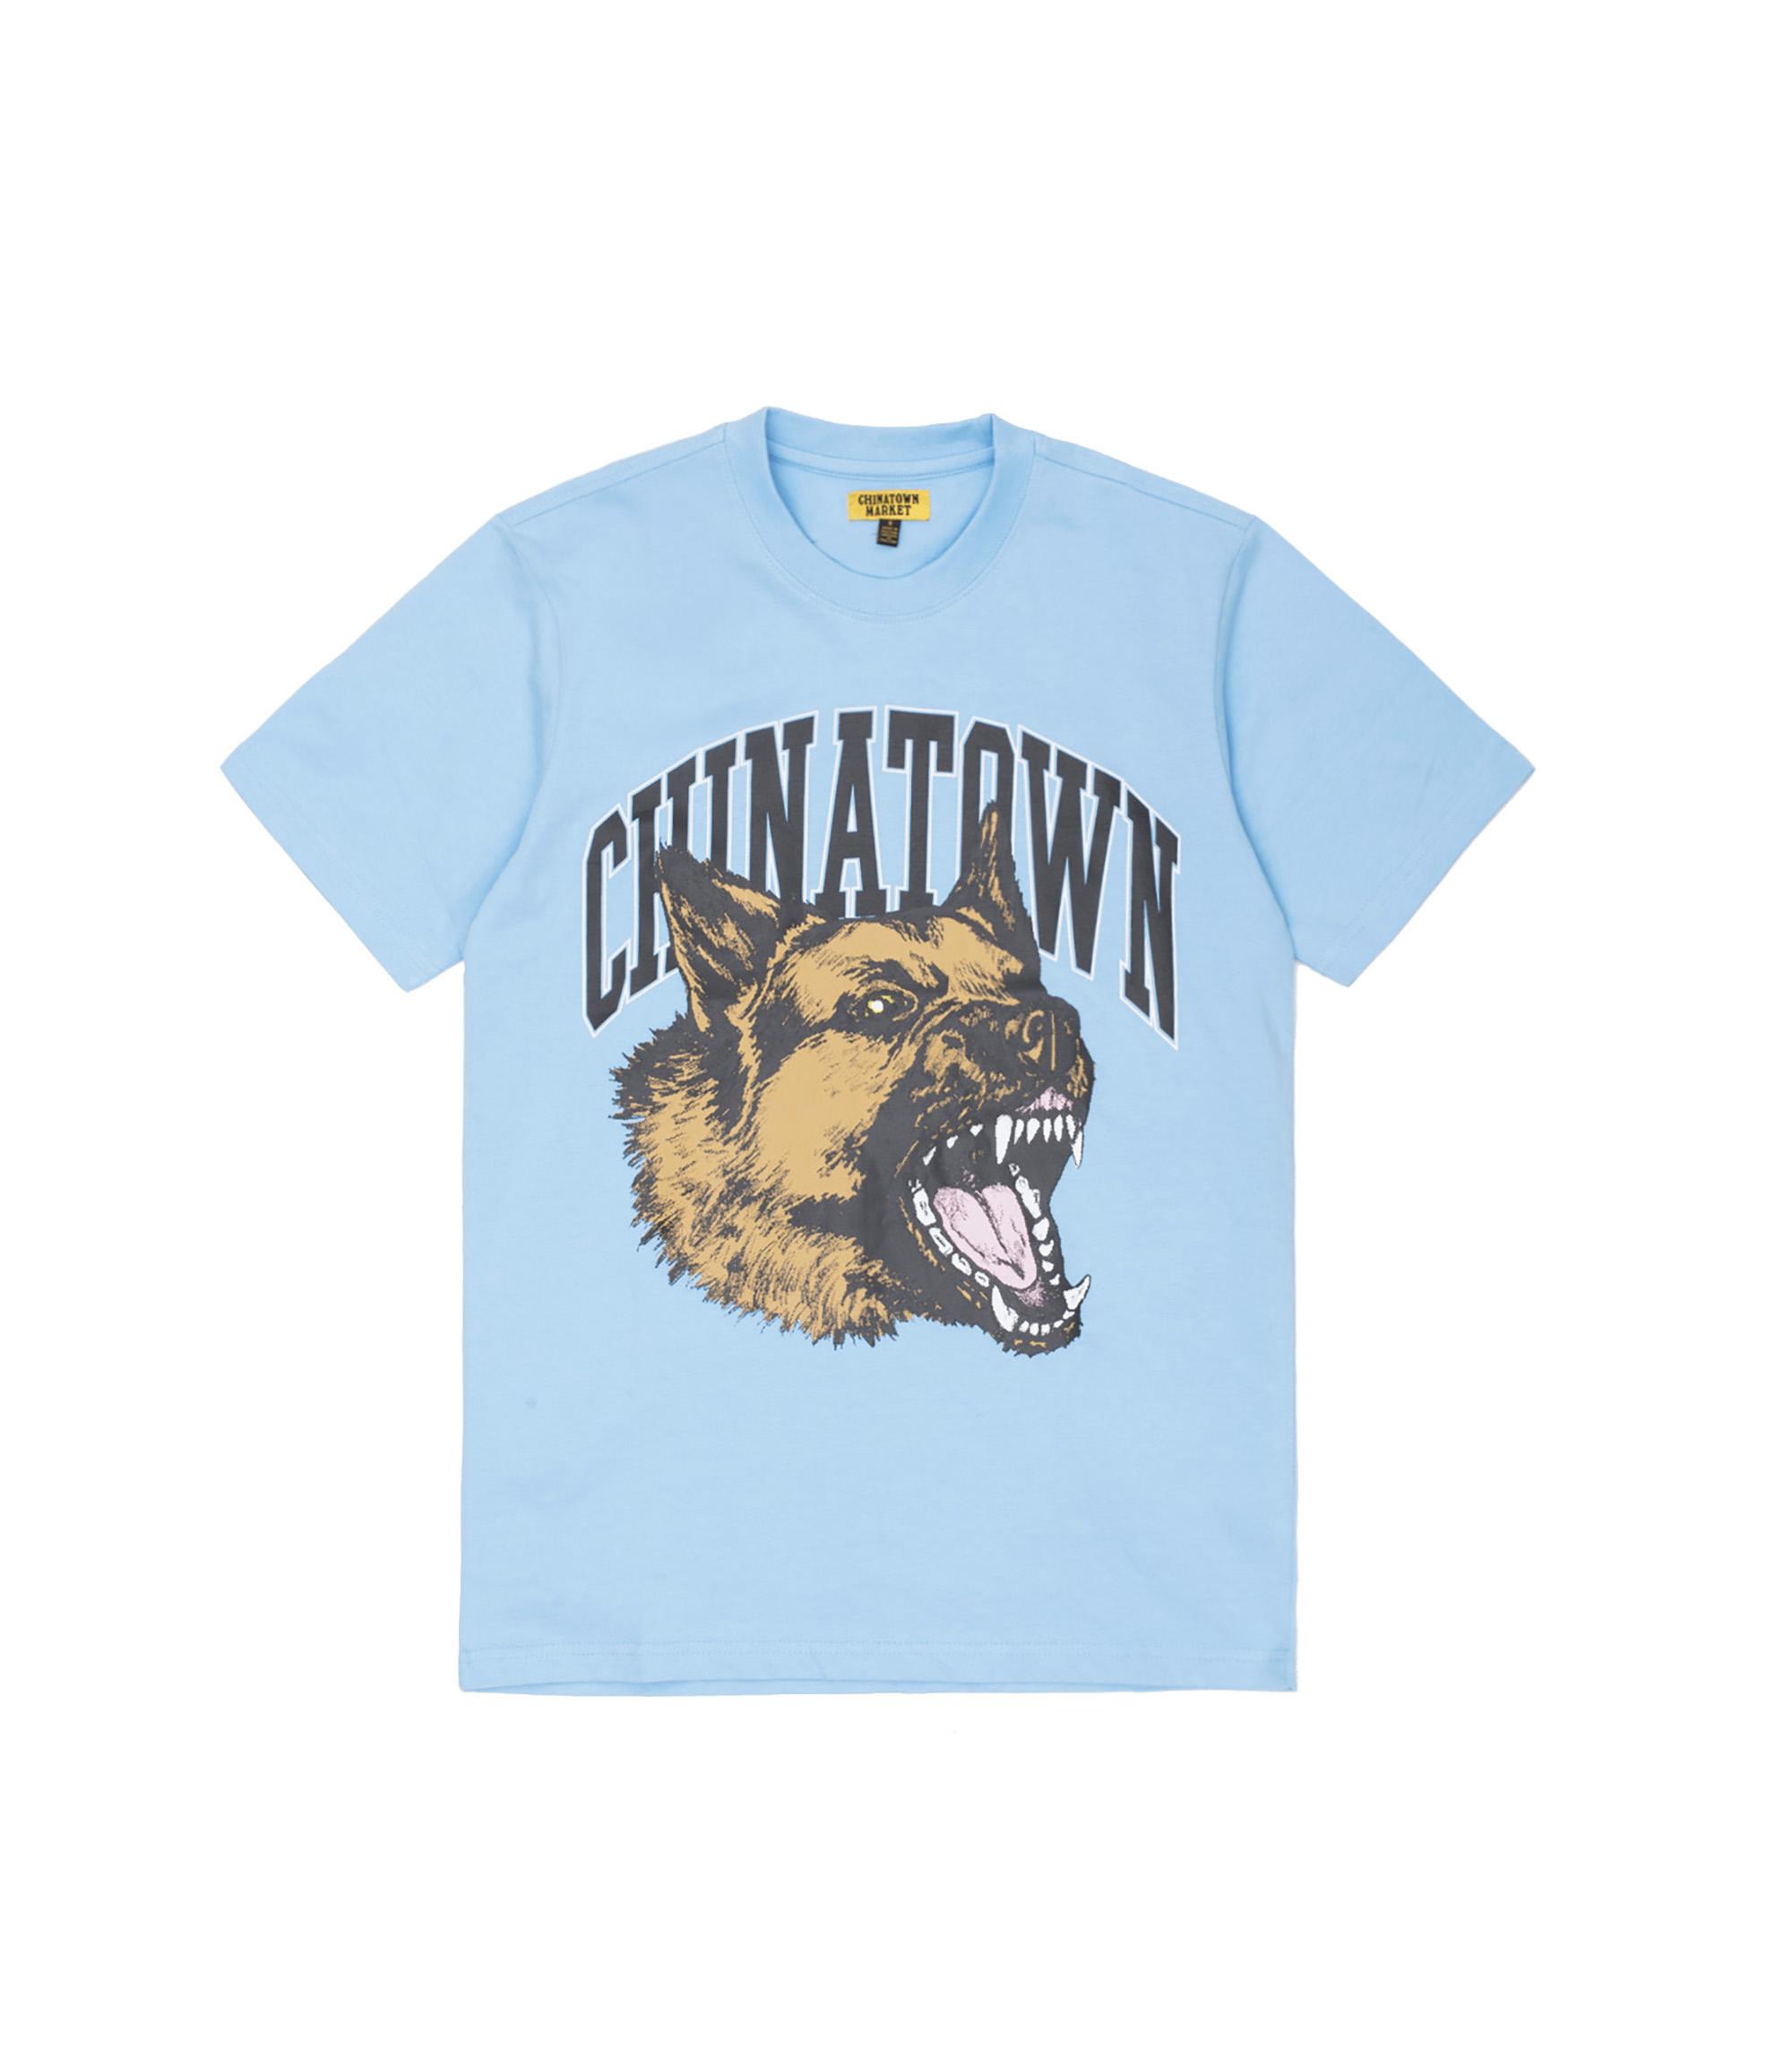 Chinatown Market Beware T-Shirt Light Blue